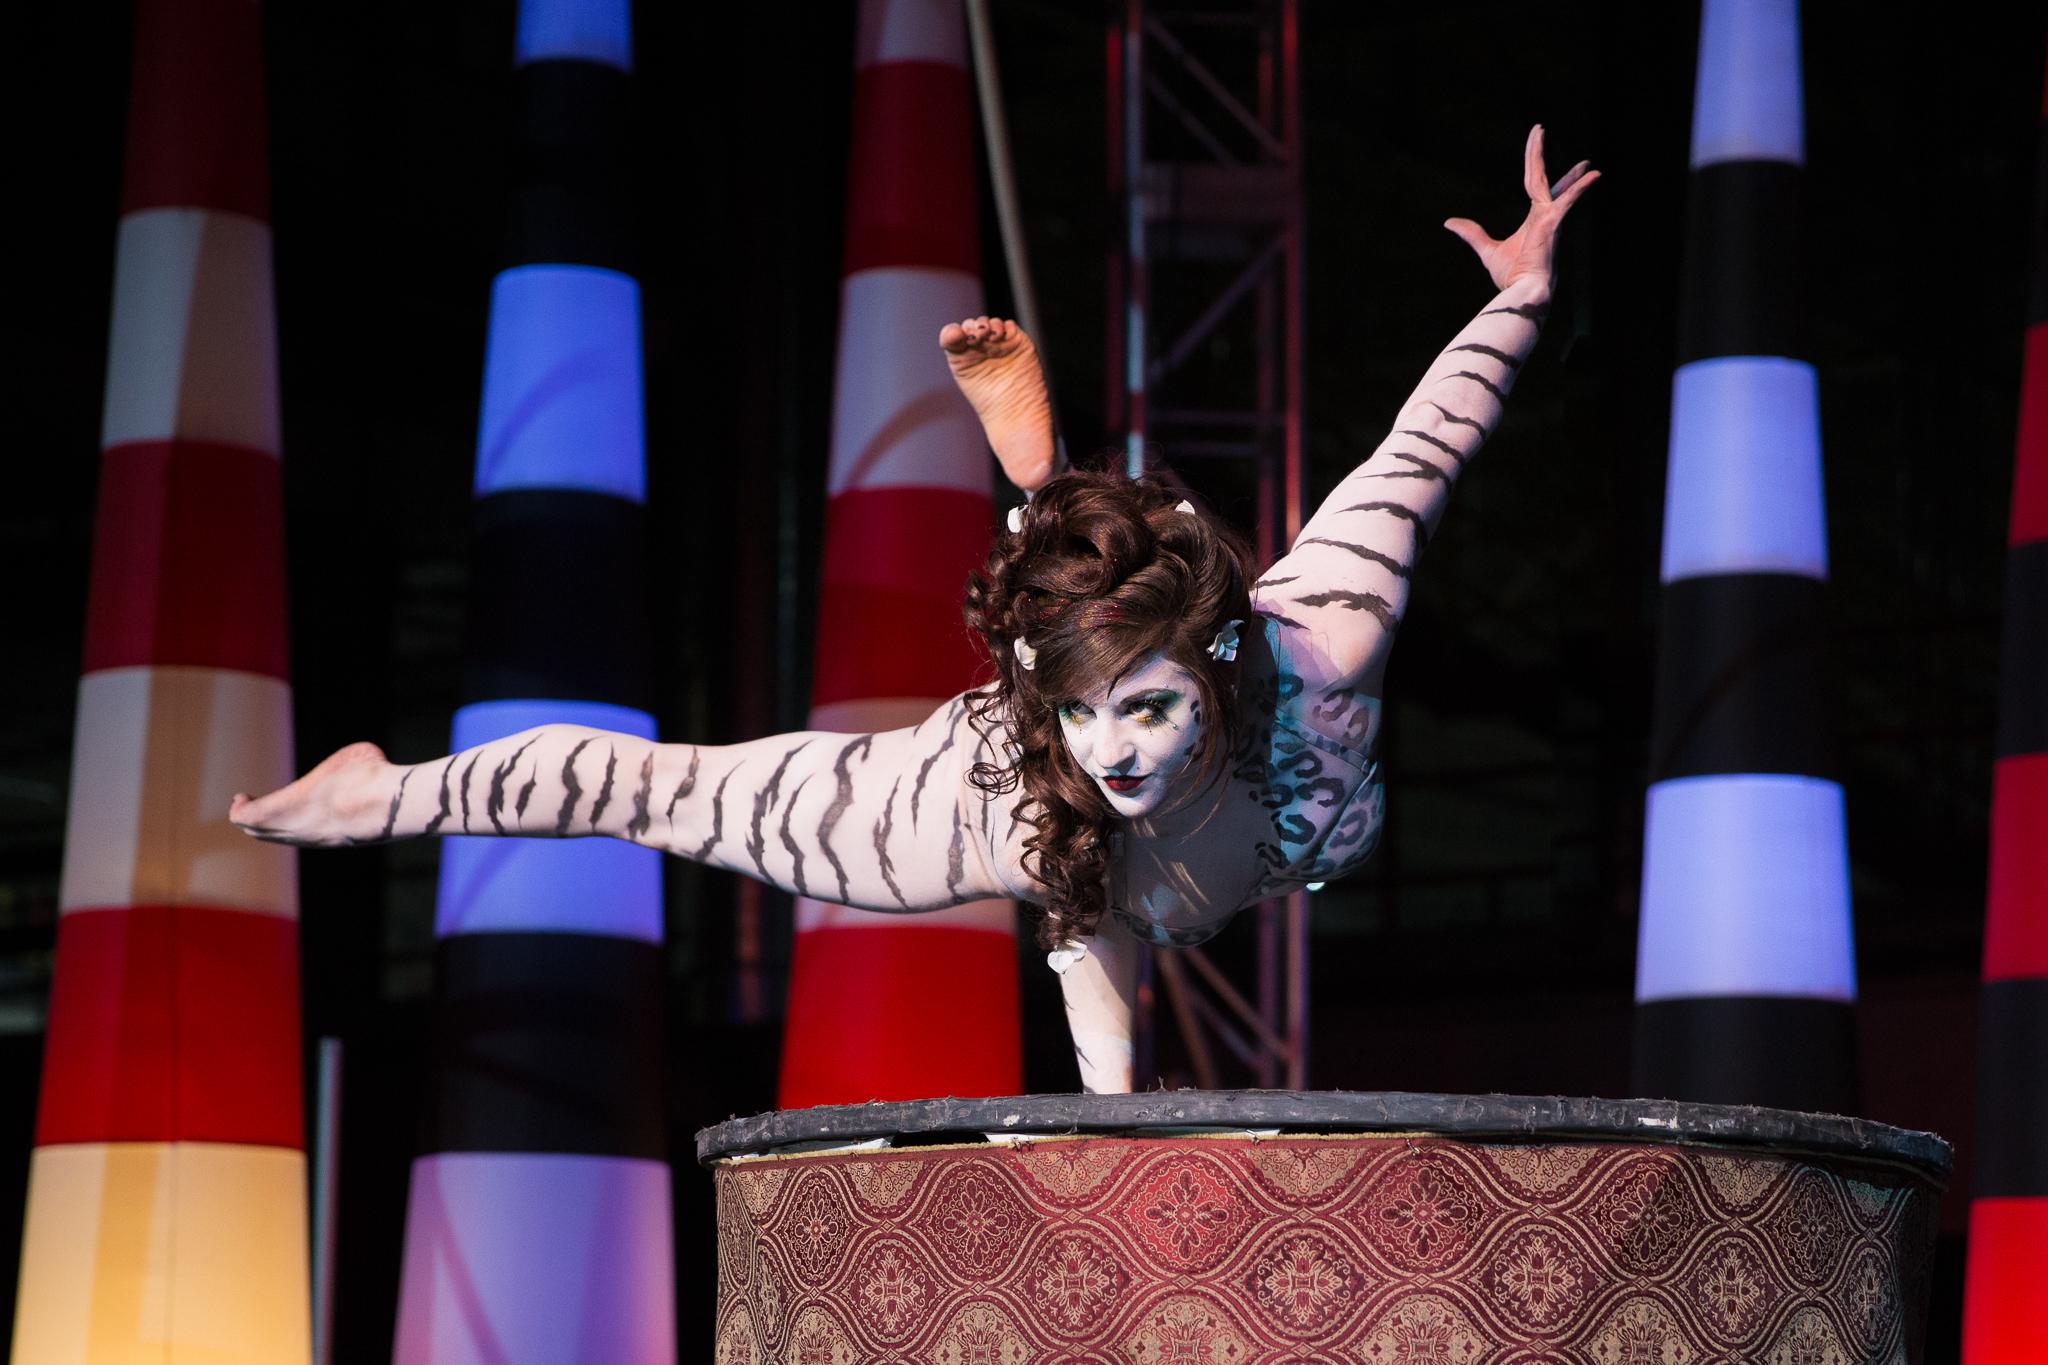 Lagunitas Beer Circus is returning to Chicago